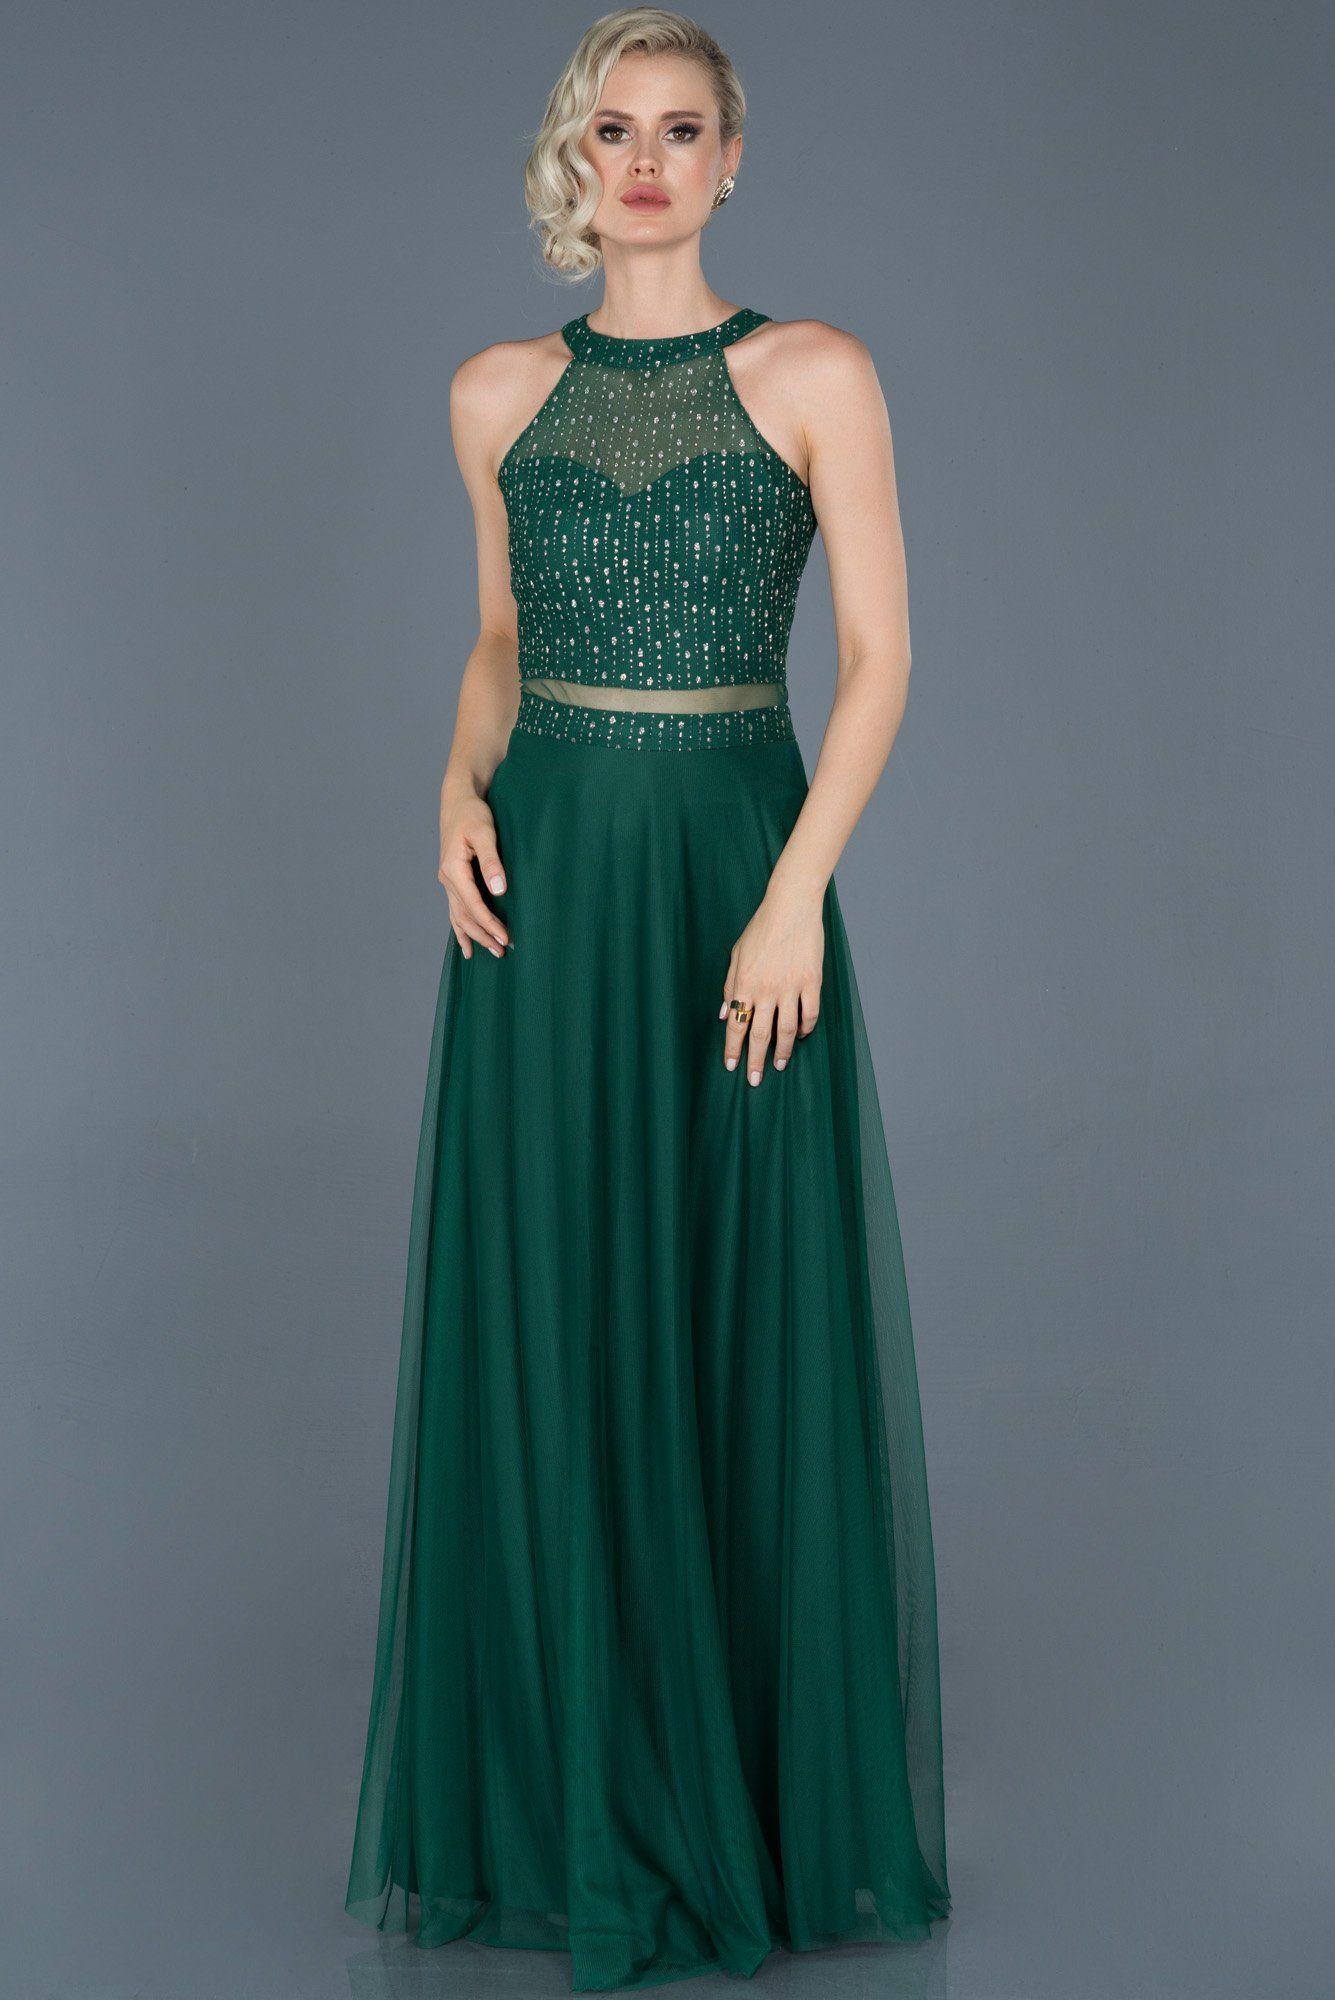 Yesil Uzun Kolsuz Abiye Elbise Abu766 Model Dress Evening Dresses Long Prom Dress